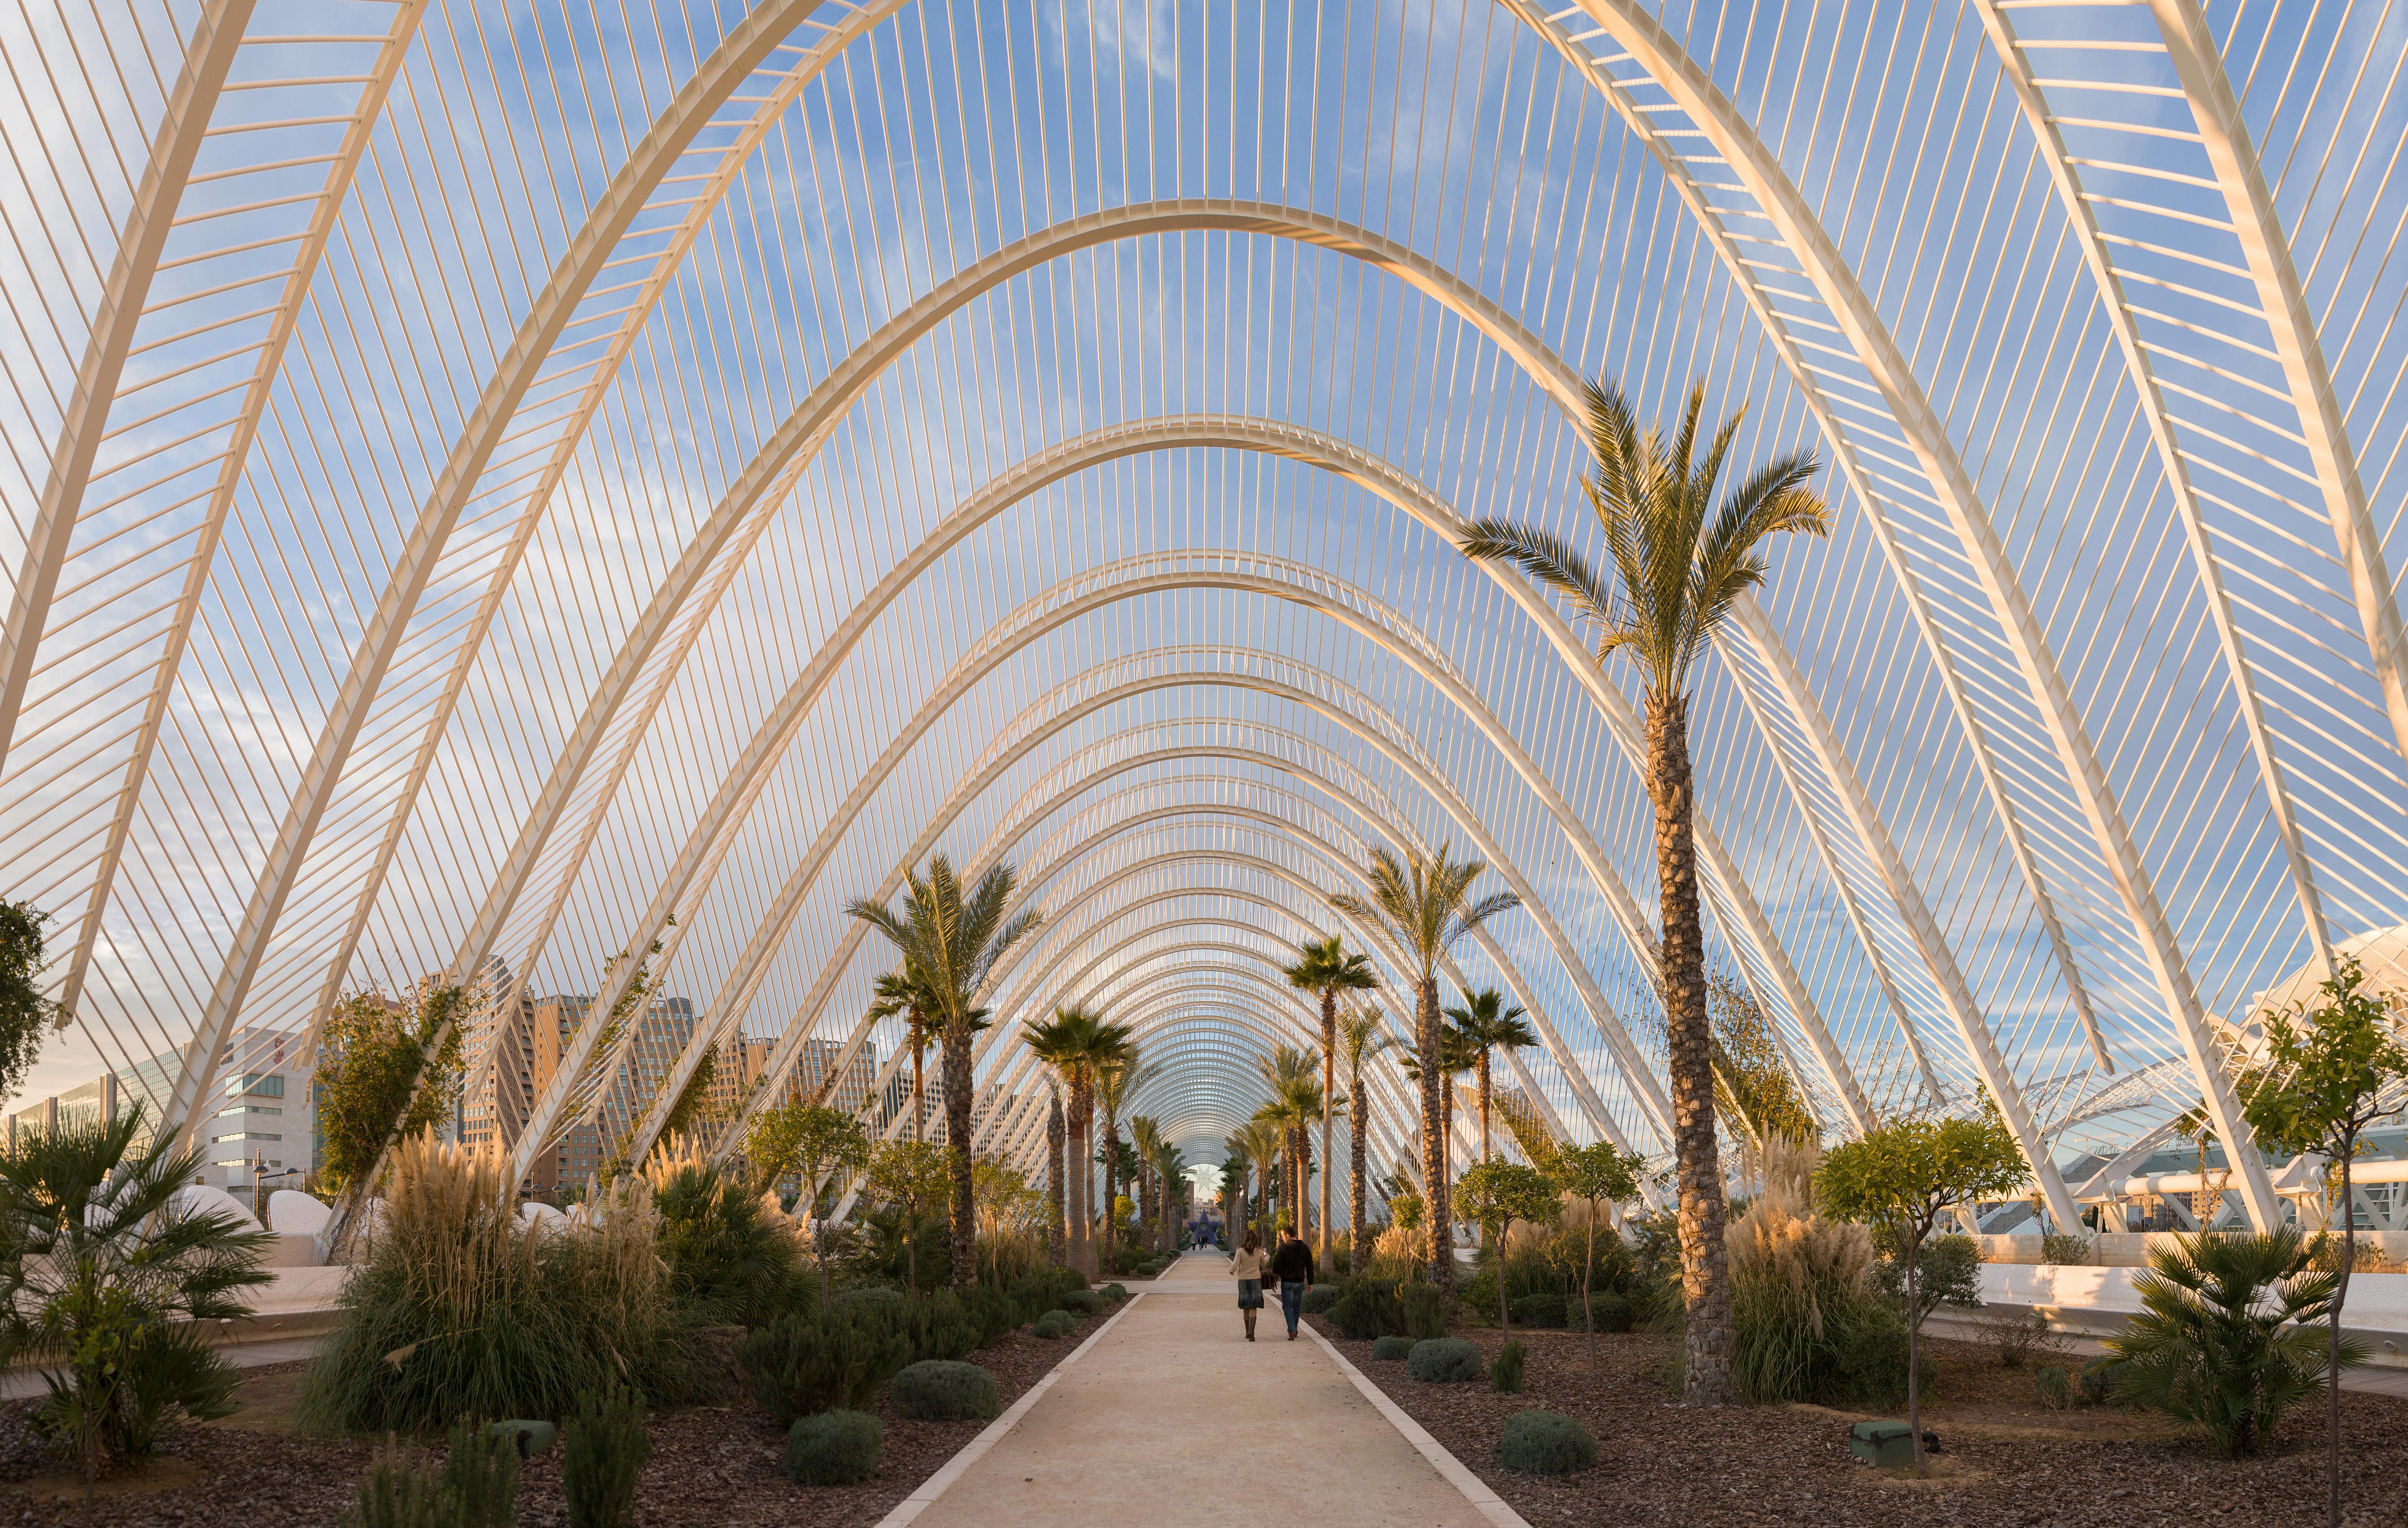 File L Umbracle Valencia Spain Jan 2007 Jpg Wikipedia